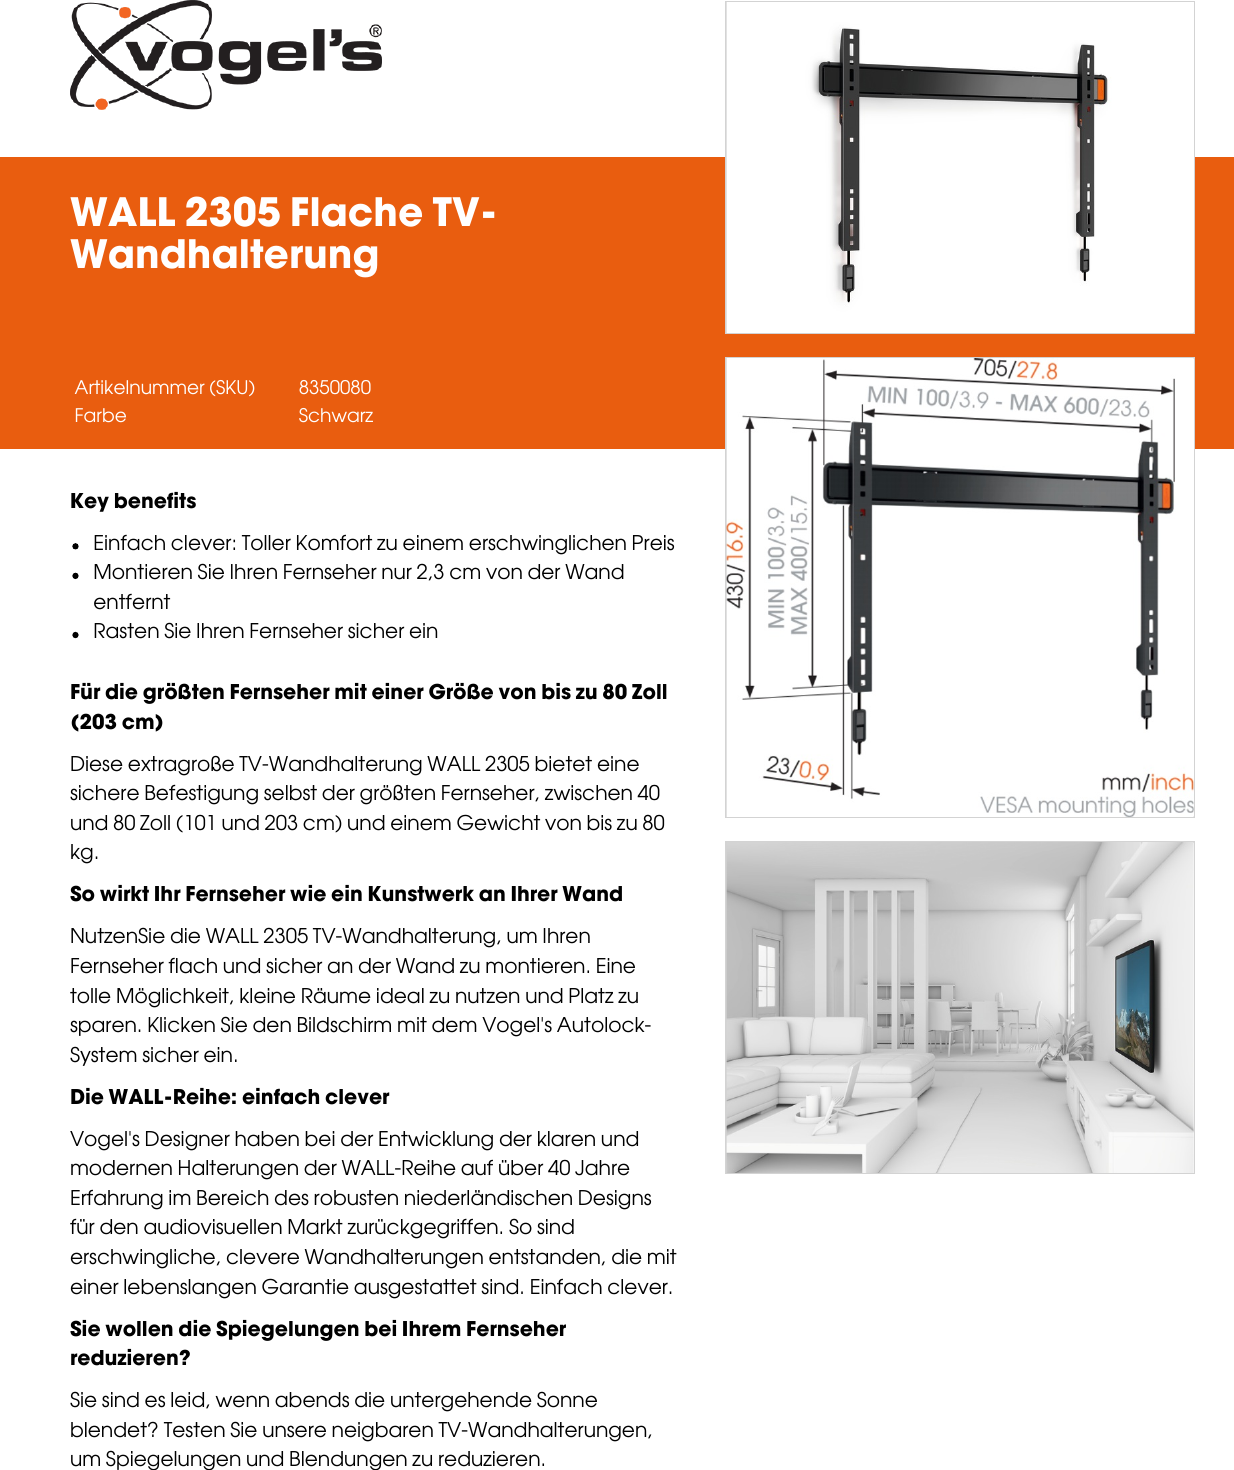 Leaflet Version 4 0 Wall 2305 Flache Tv Wandhalterung 2120 De